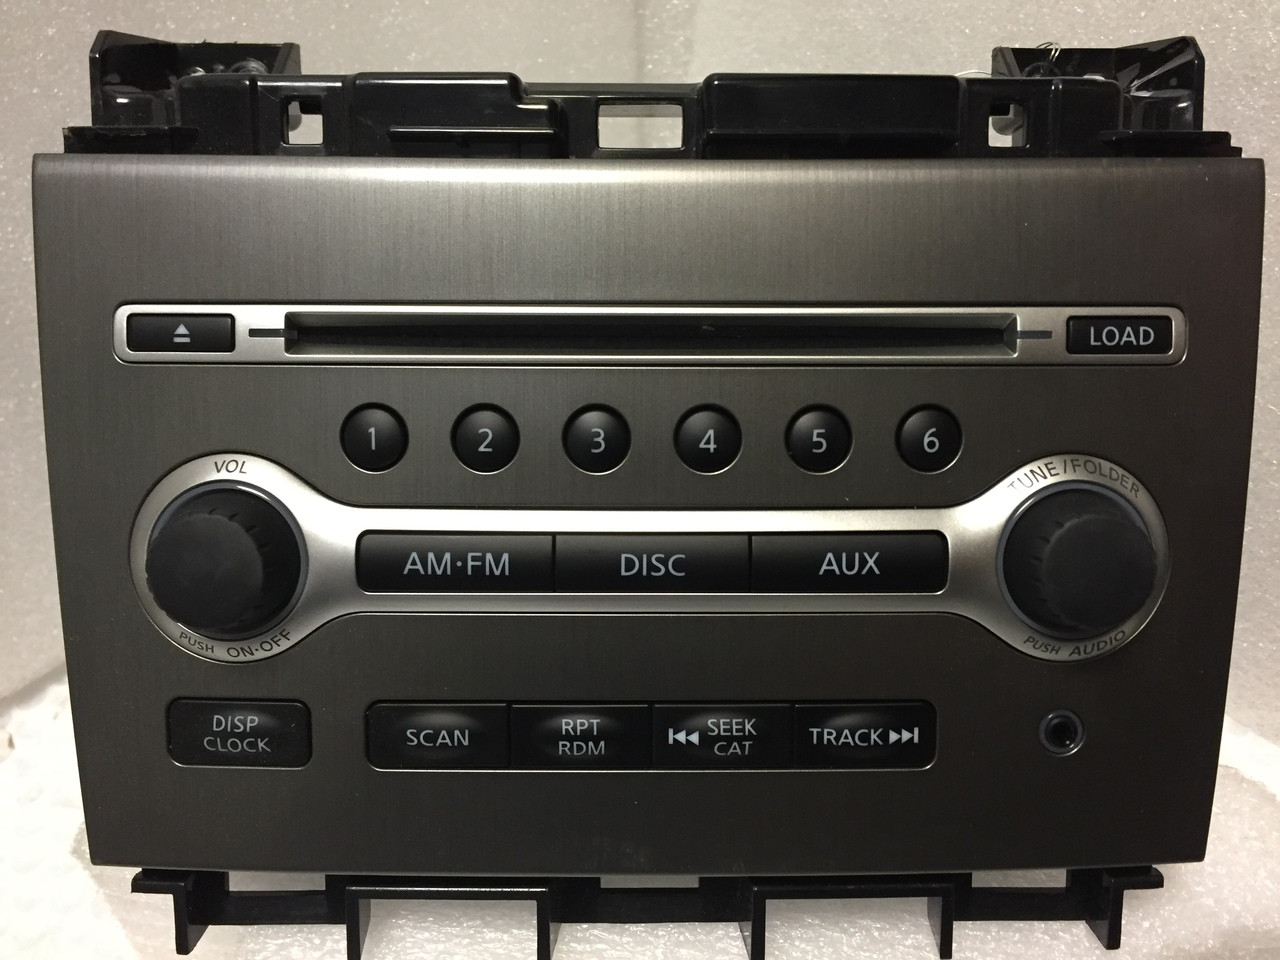 new 12 14 nissan maxima radio 6 disc changer cd mp3 player 12 13 14 cd4car [ 1280 x 960 Pixel ]